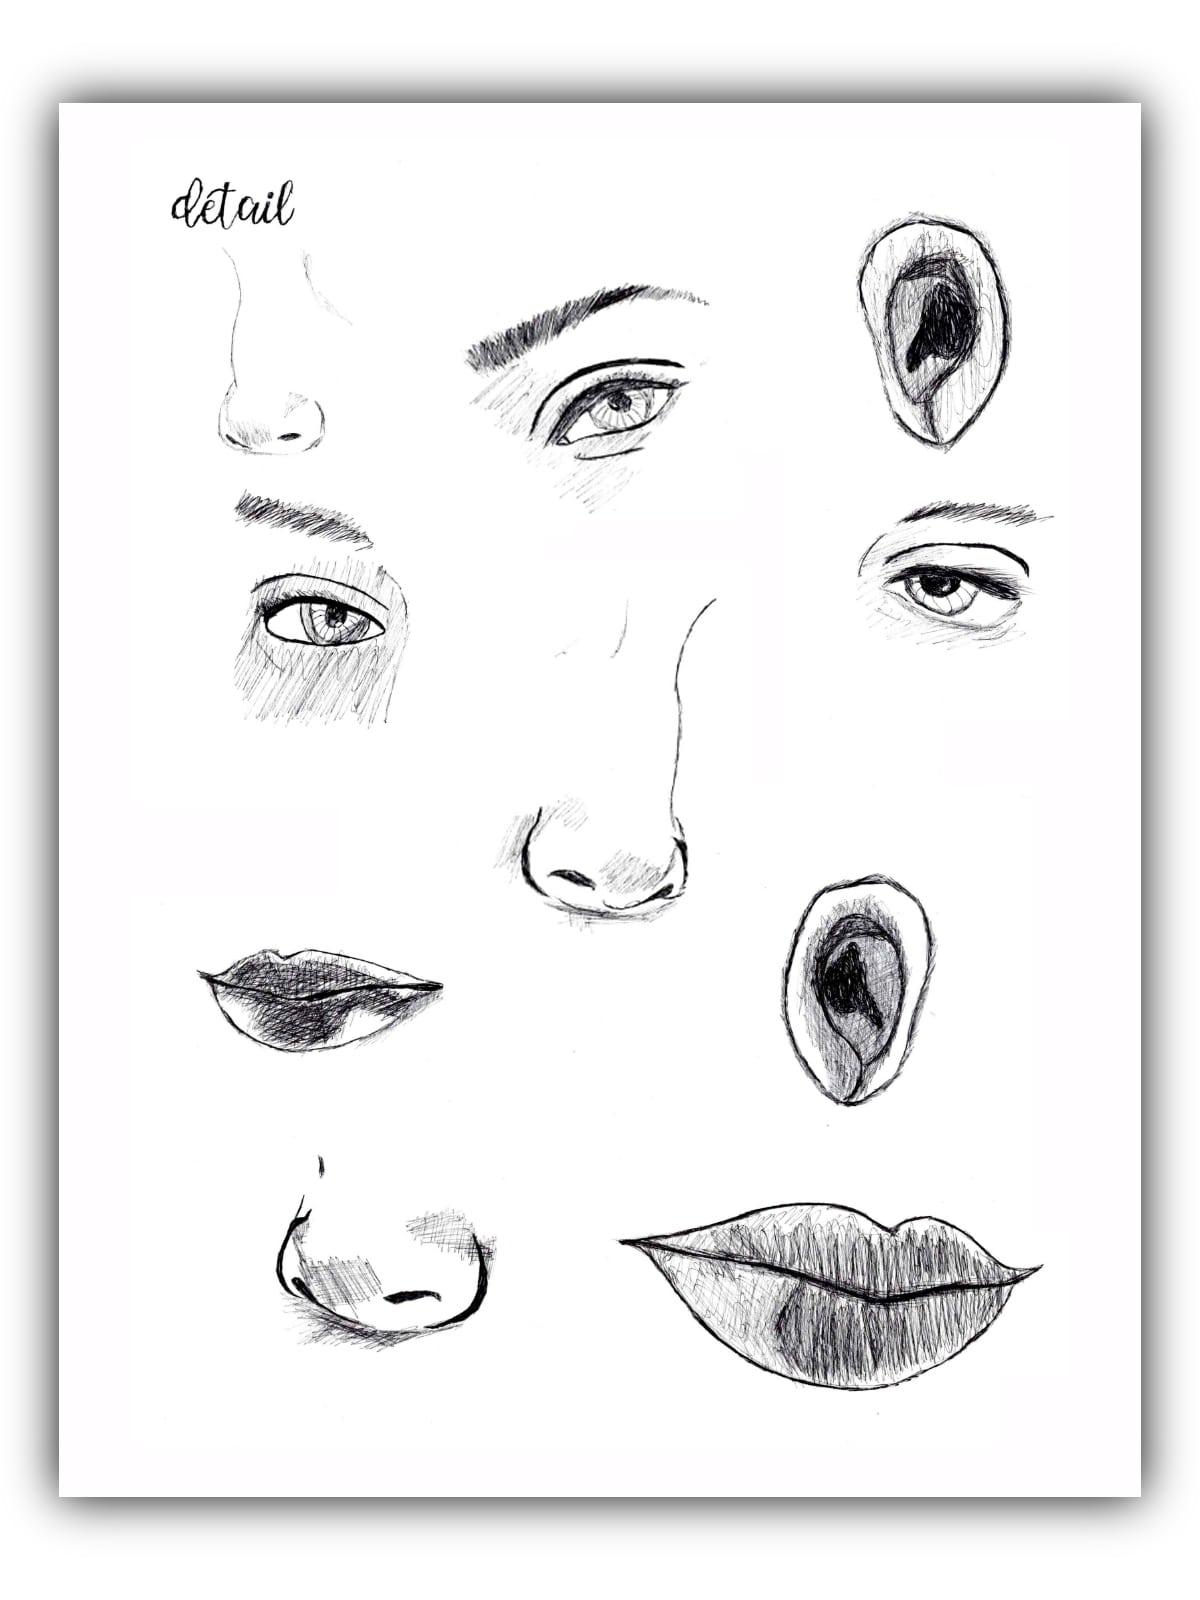 détails_visage_Valentin_Ronze_Supdesign_2020 copie-min